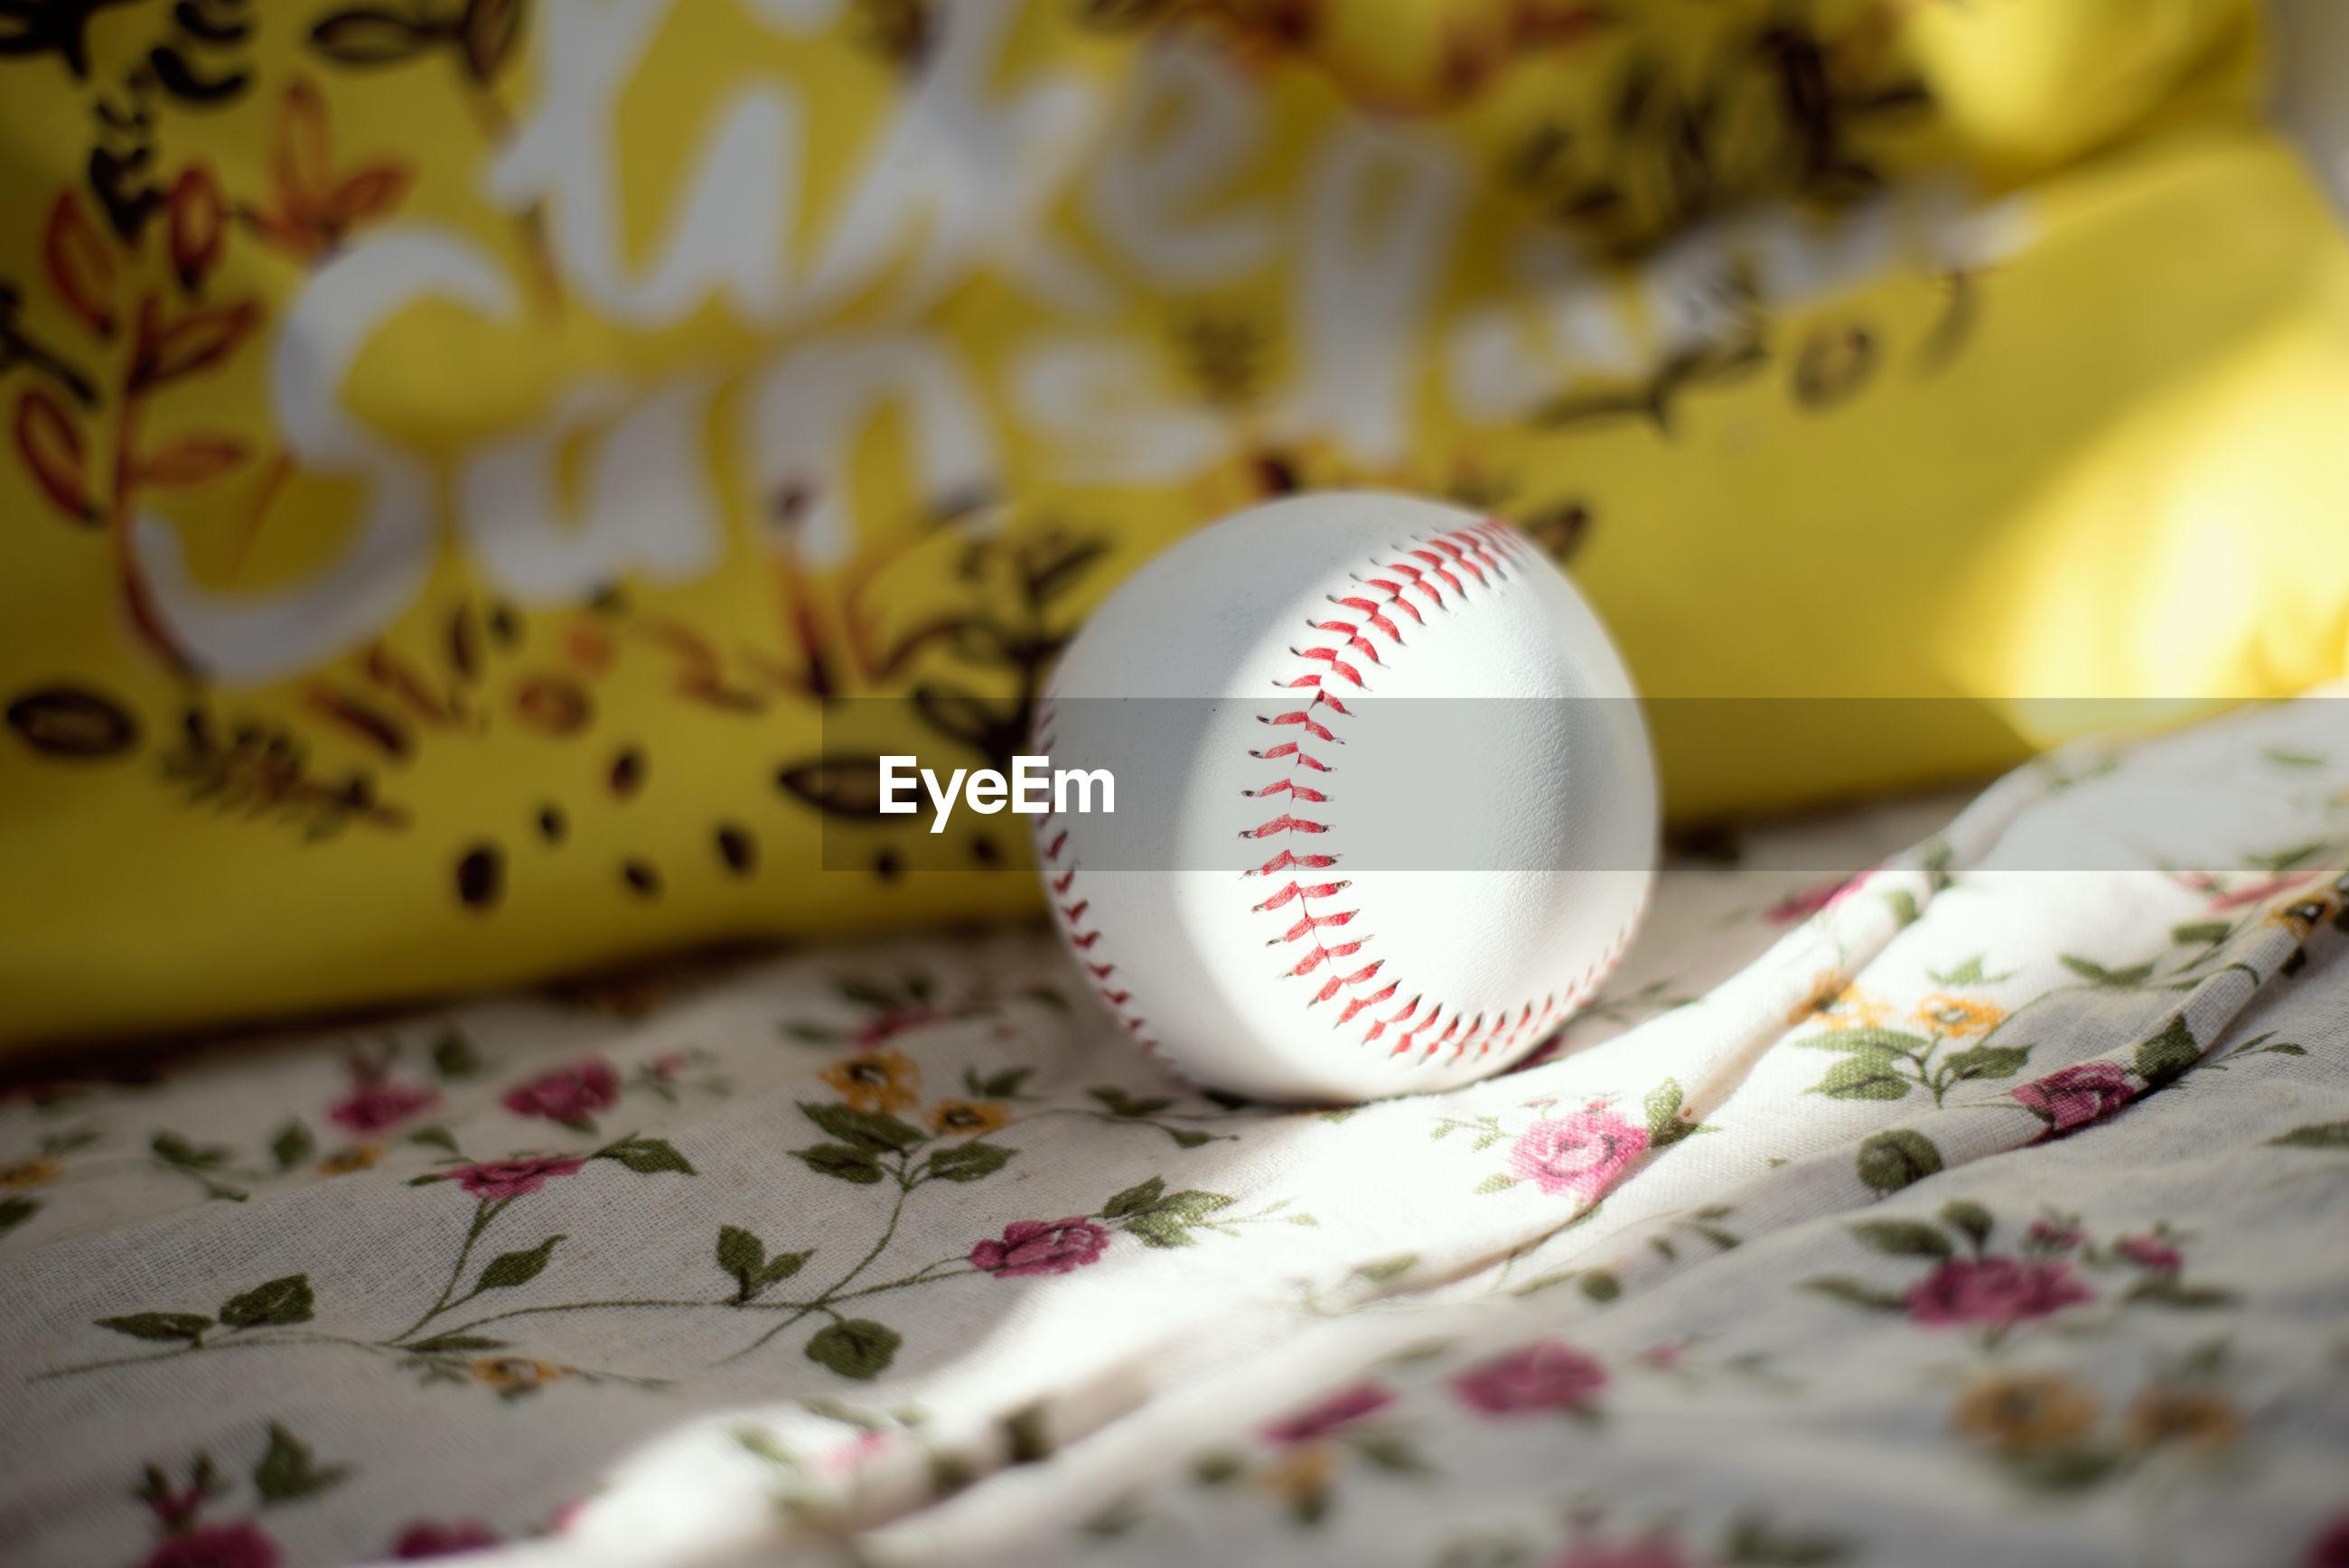 baseball, baseball - ball, sports, selective focus, indoors, yellow, no people, ball, pink, pattern, close-up, baseball glove, team sport, furniture, white